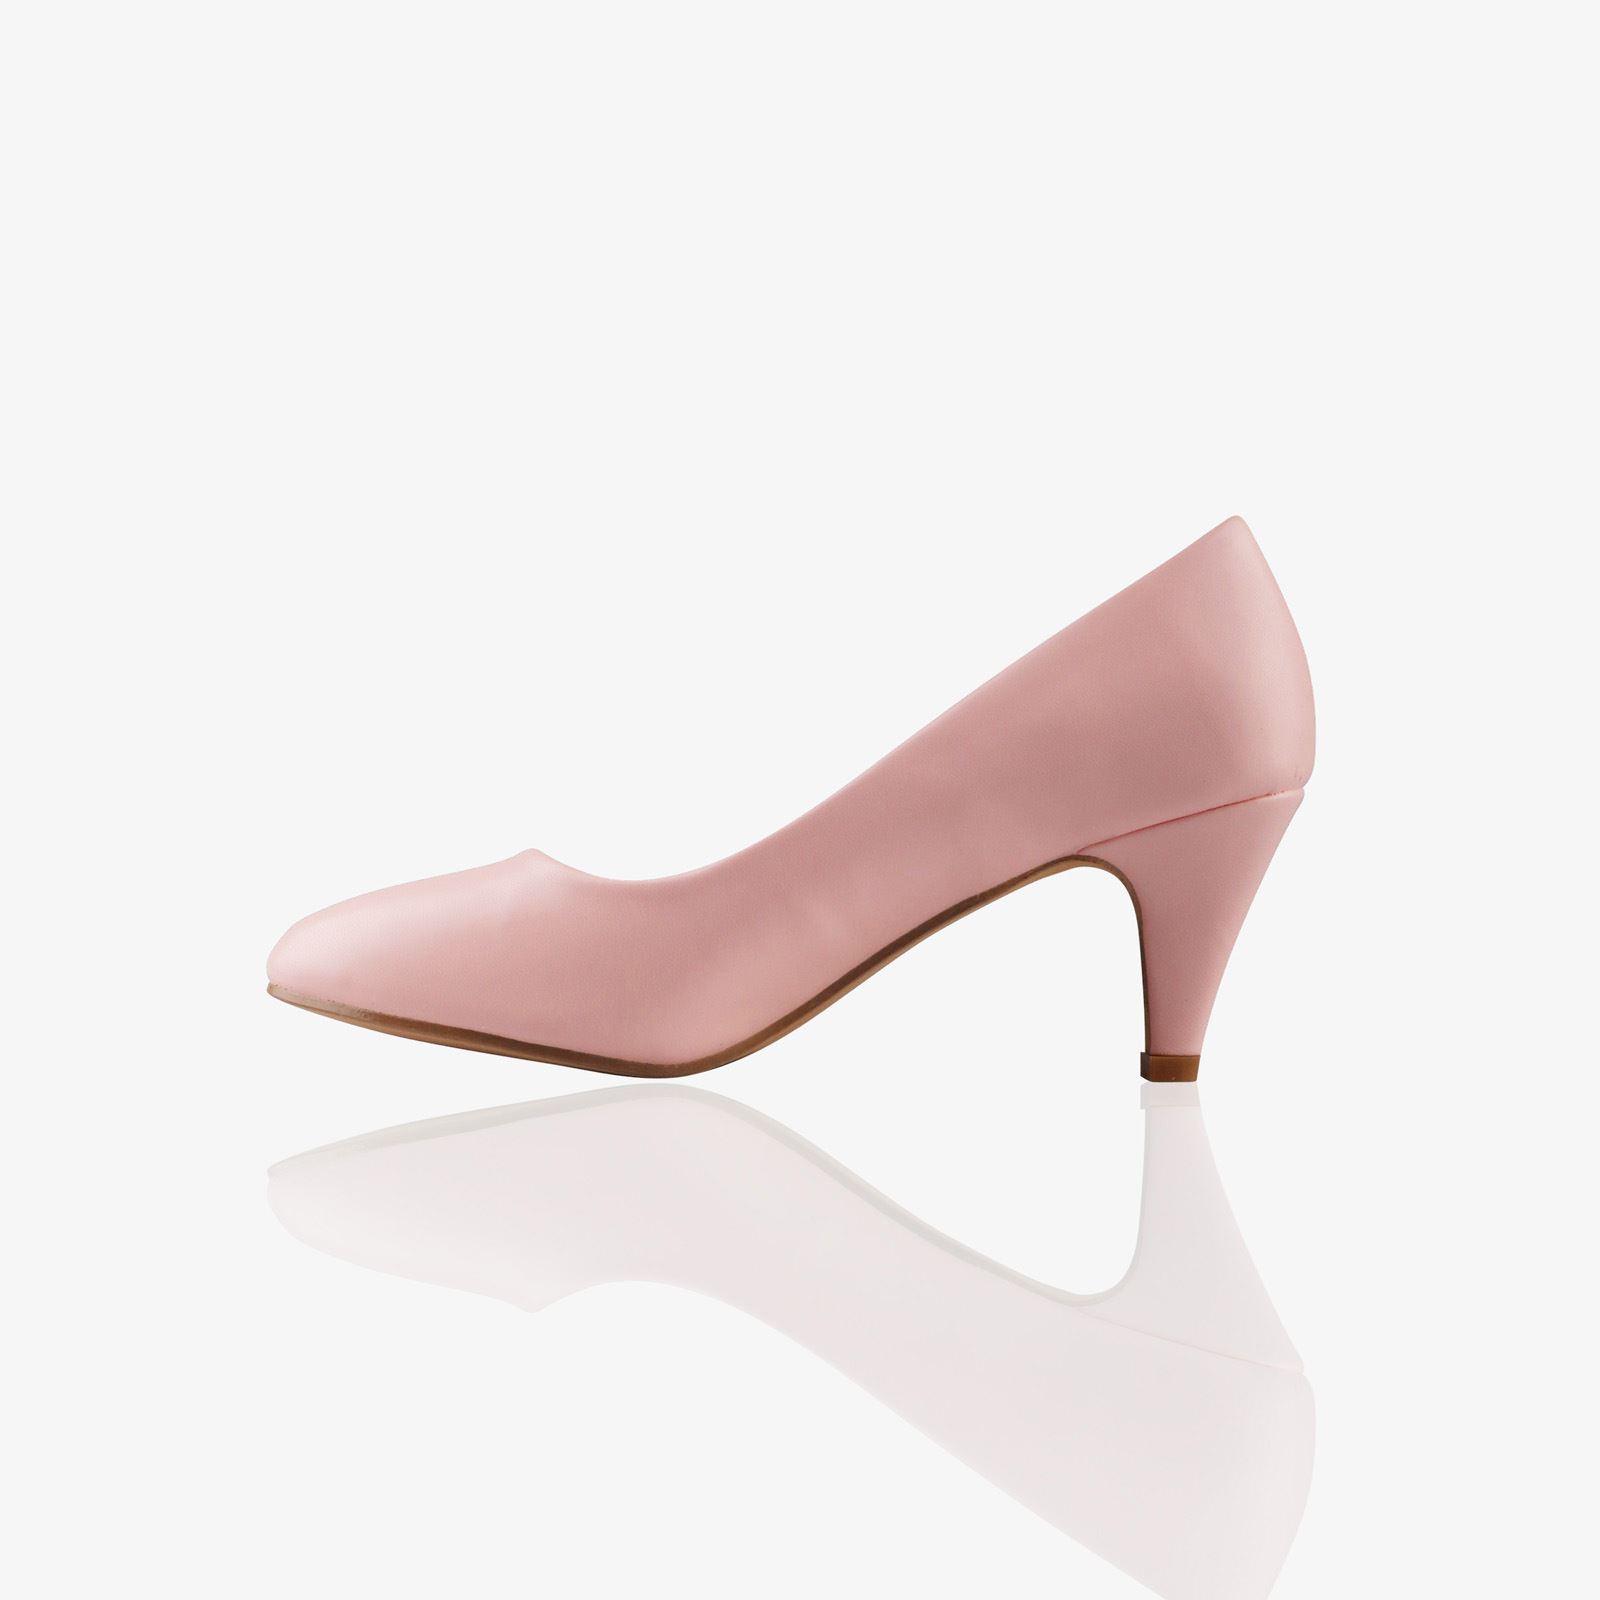 Womens-Ladies-Mid-Heel-Court-Shoes-Slip-On-Low-Kitten-Heels-Pumps-Matte-Size-3-8 thumbnail 20